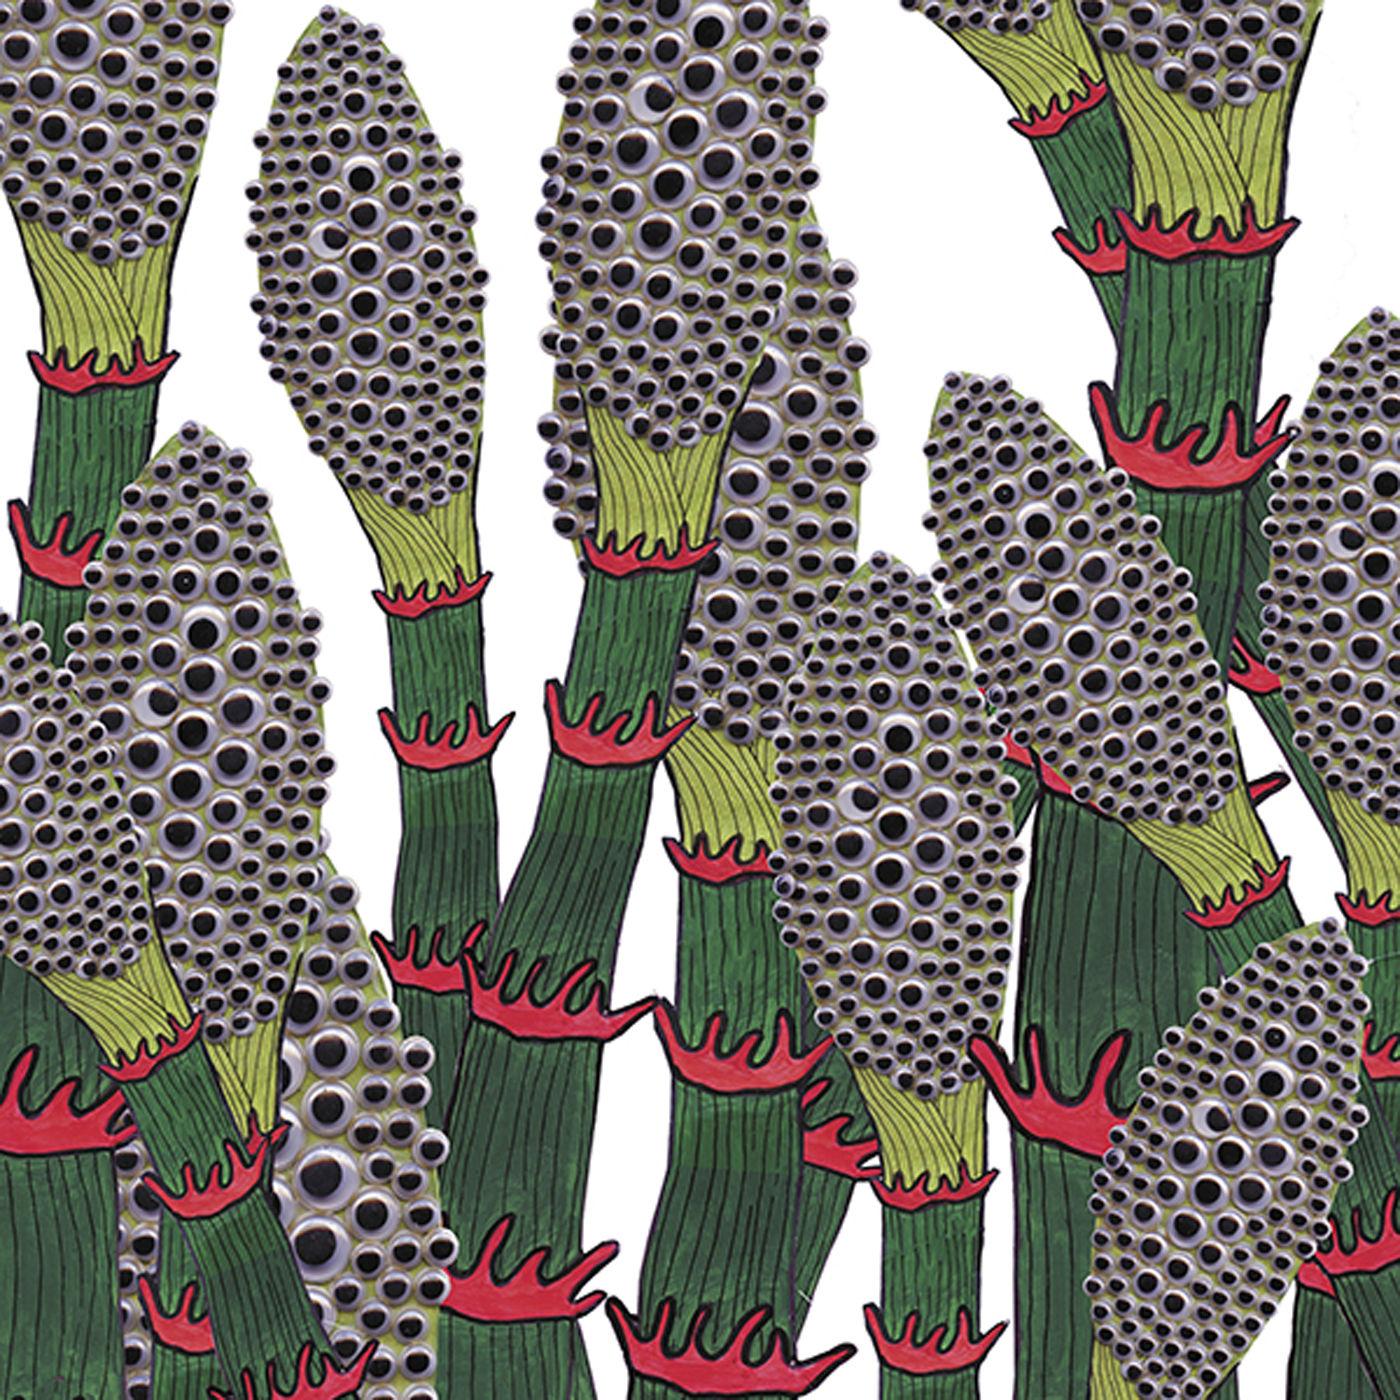 indie-music-and-television-blog-part-chimp-iv-album-cover